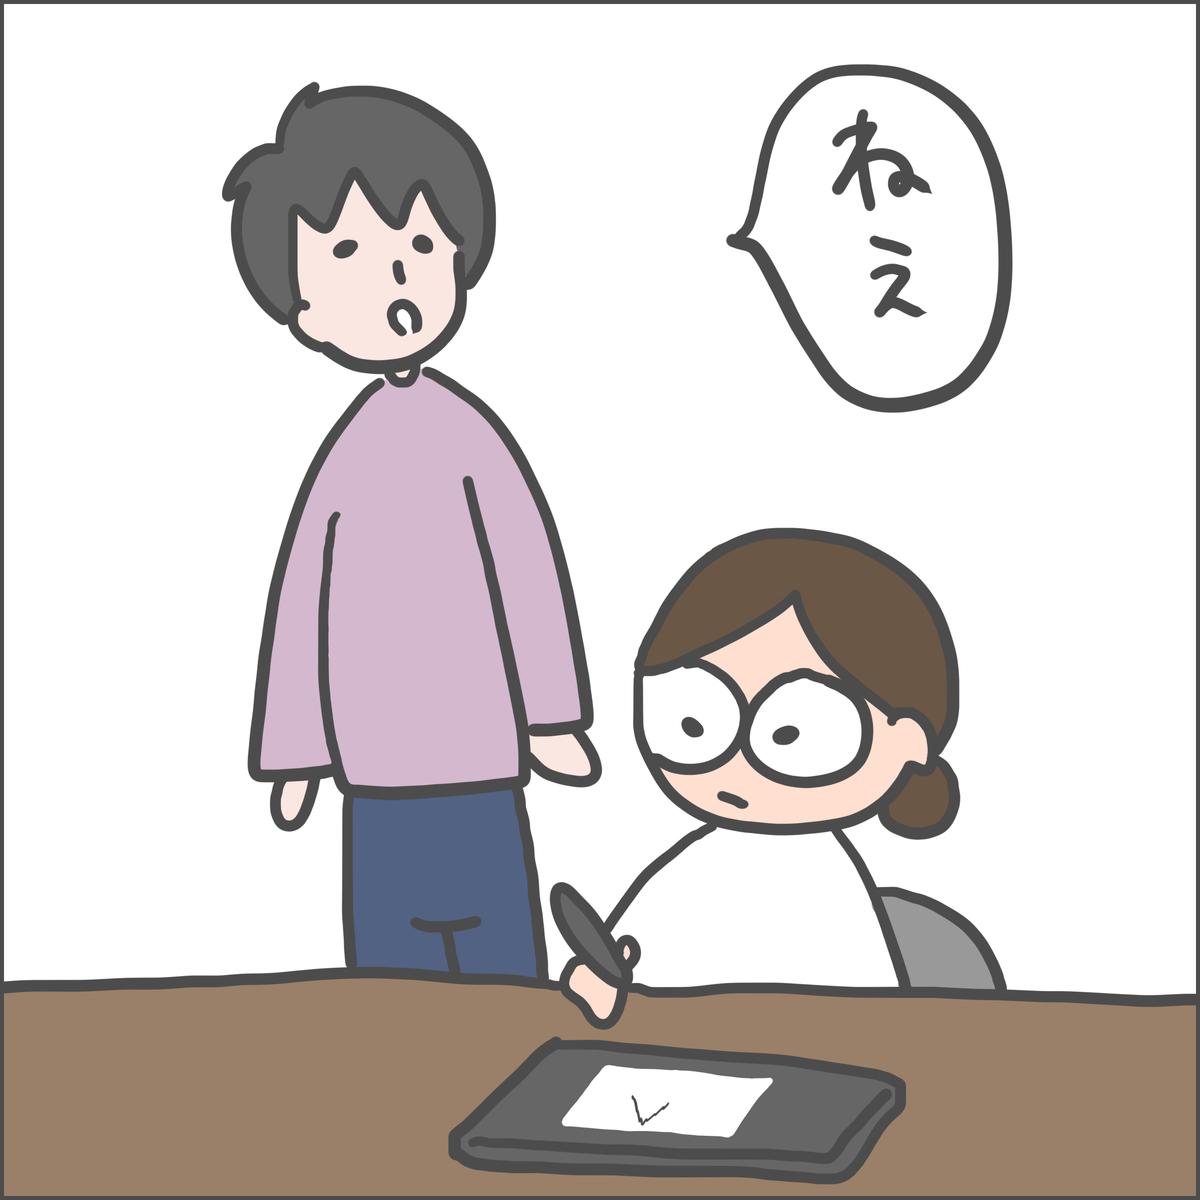 f:id:ika_yoshi:20201018215326j:plain